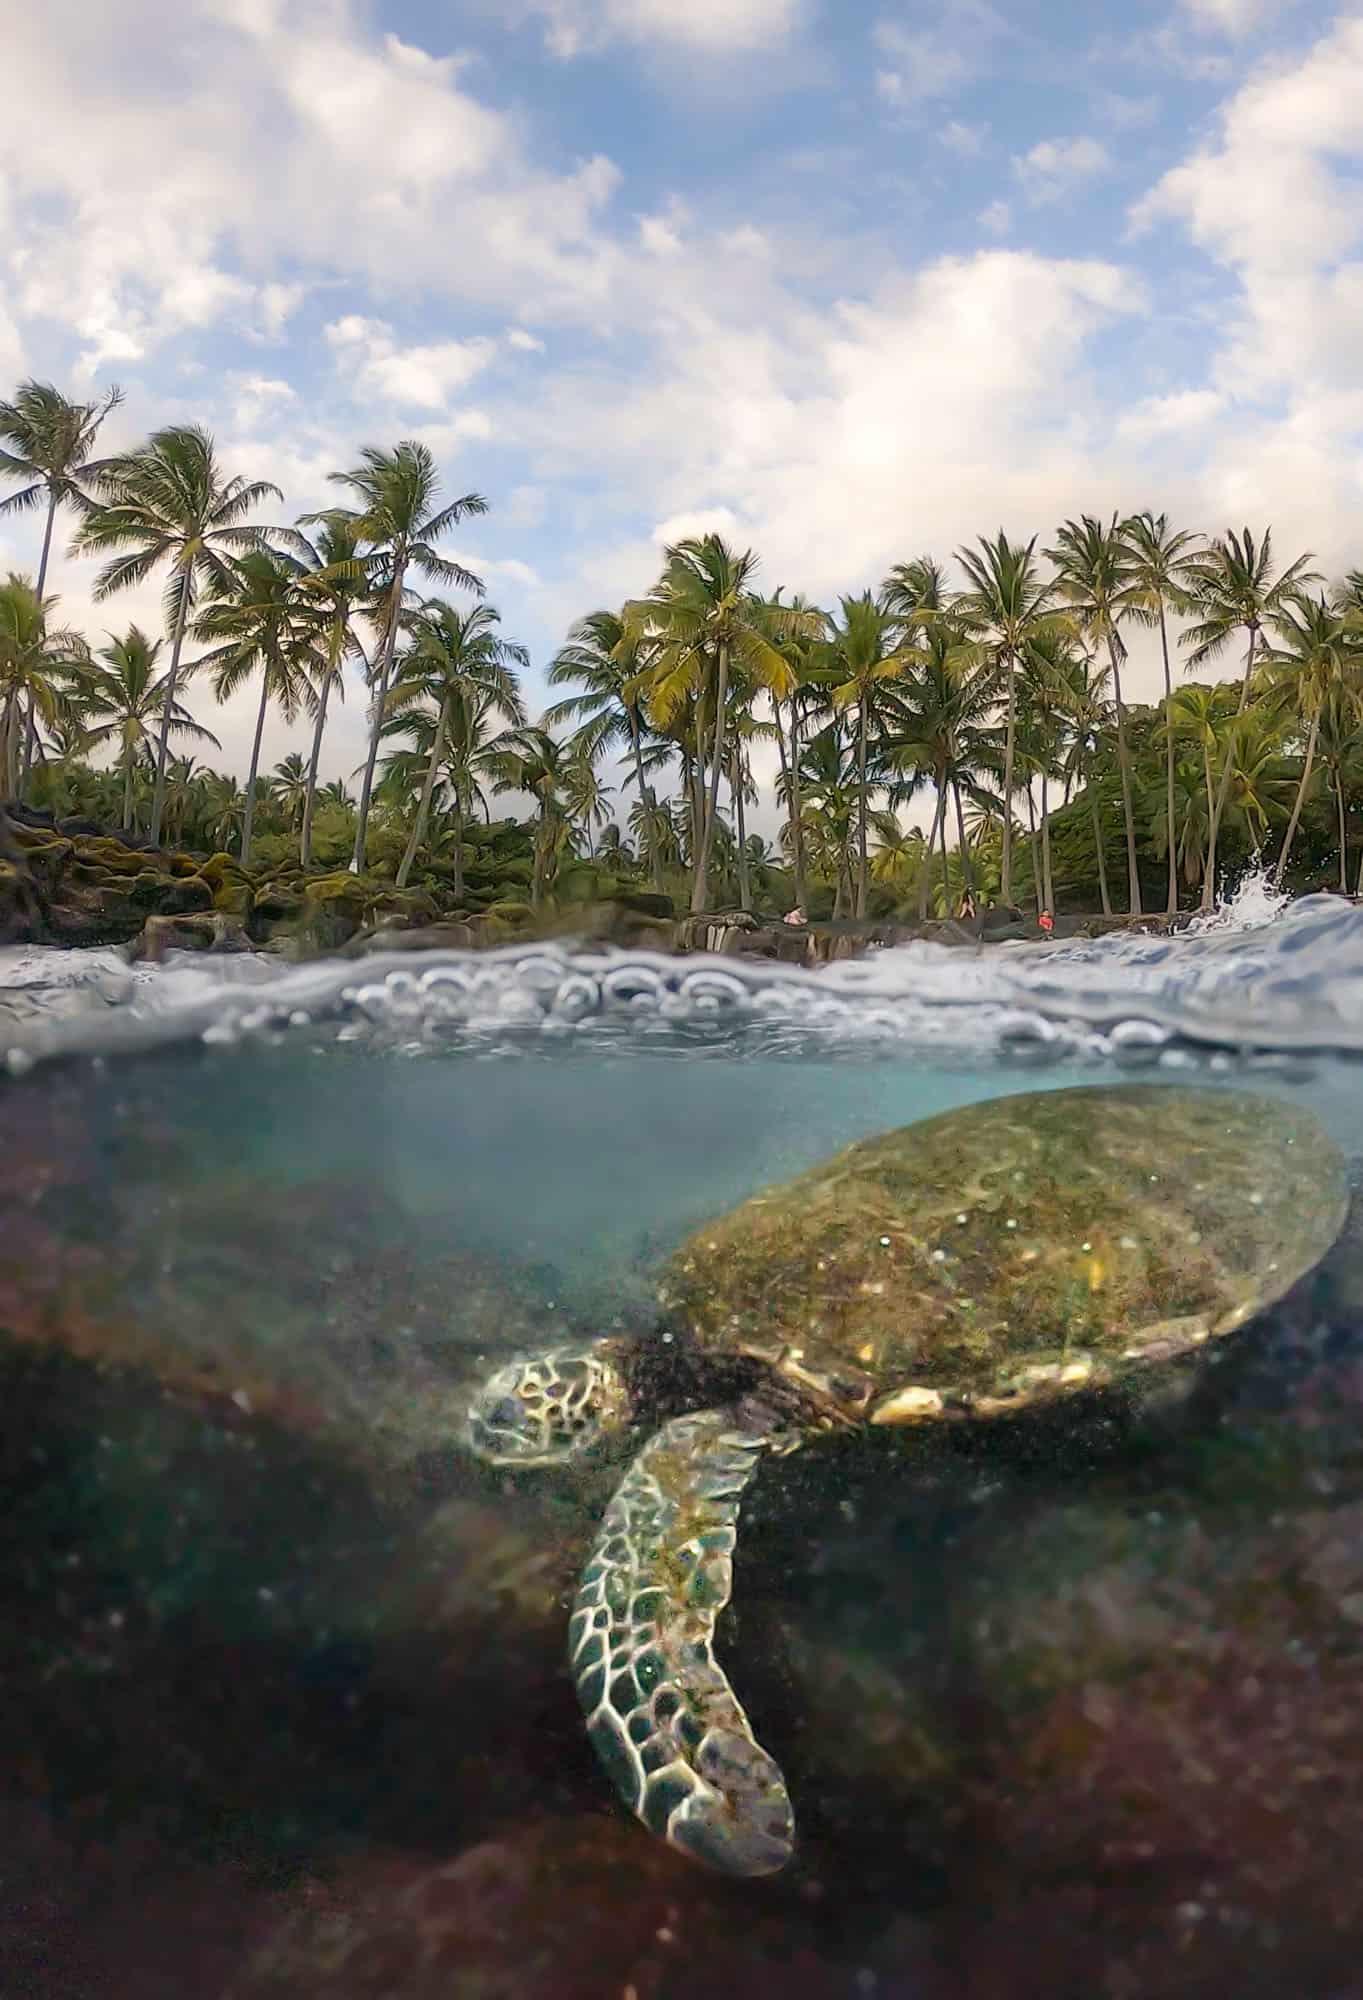 A green sea turtle swims along the black sand beach of Big Island.